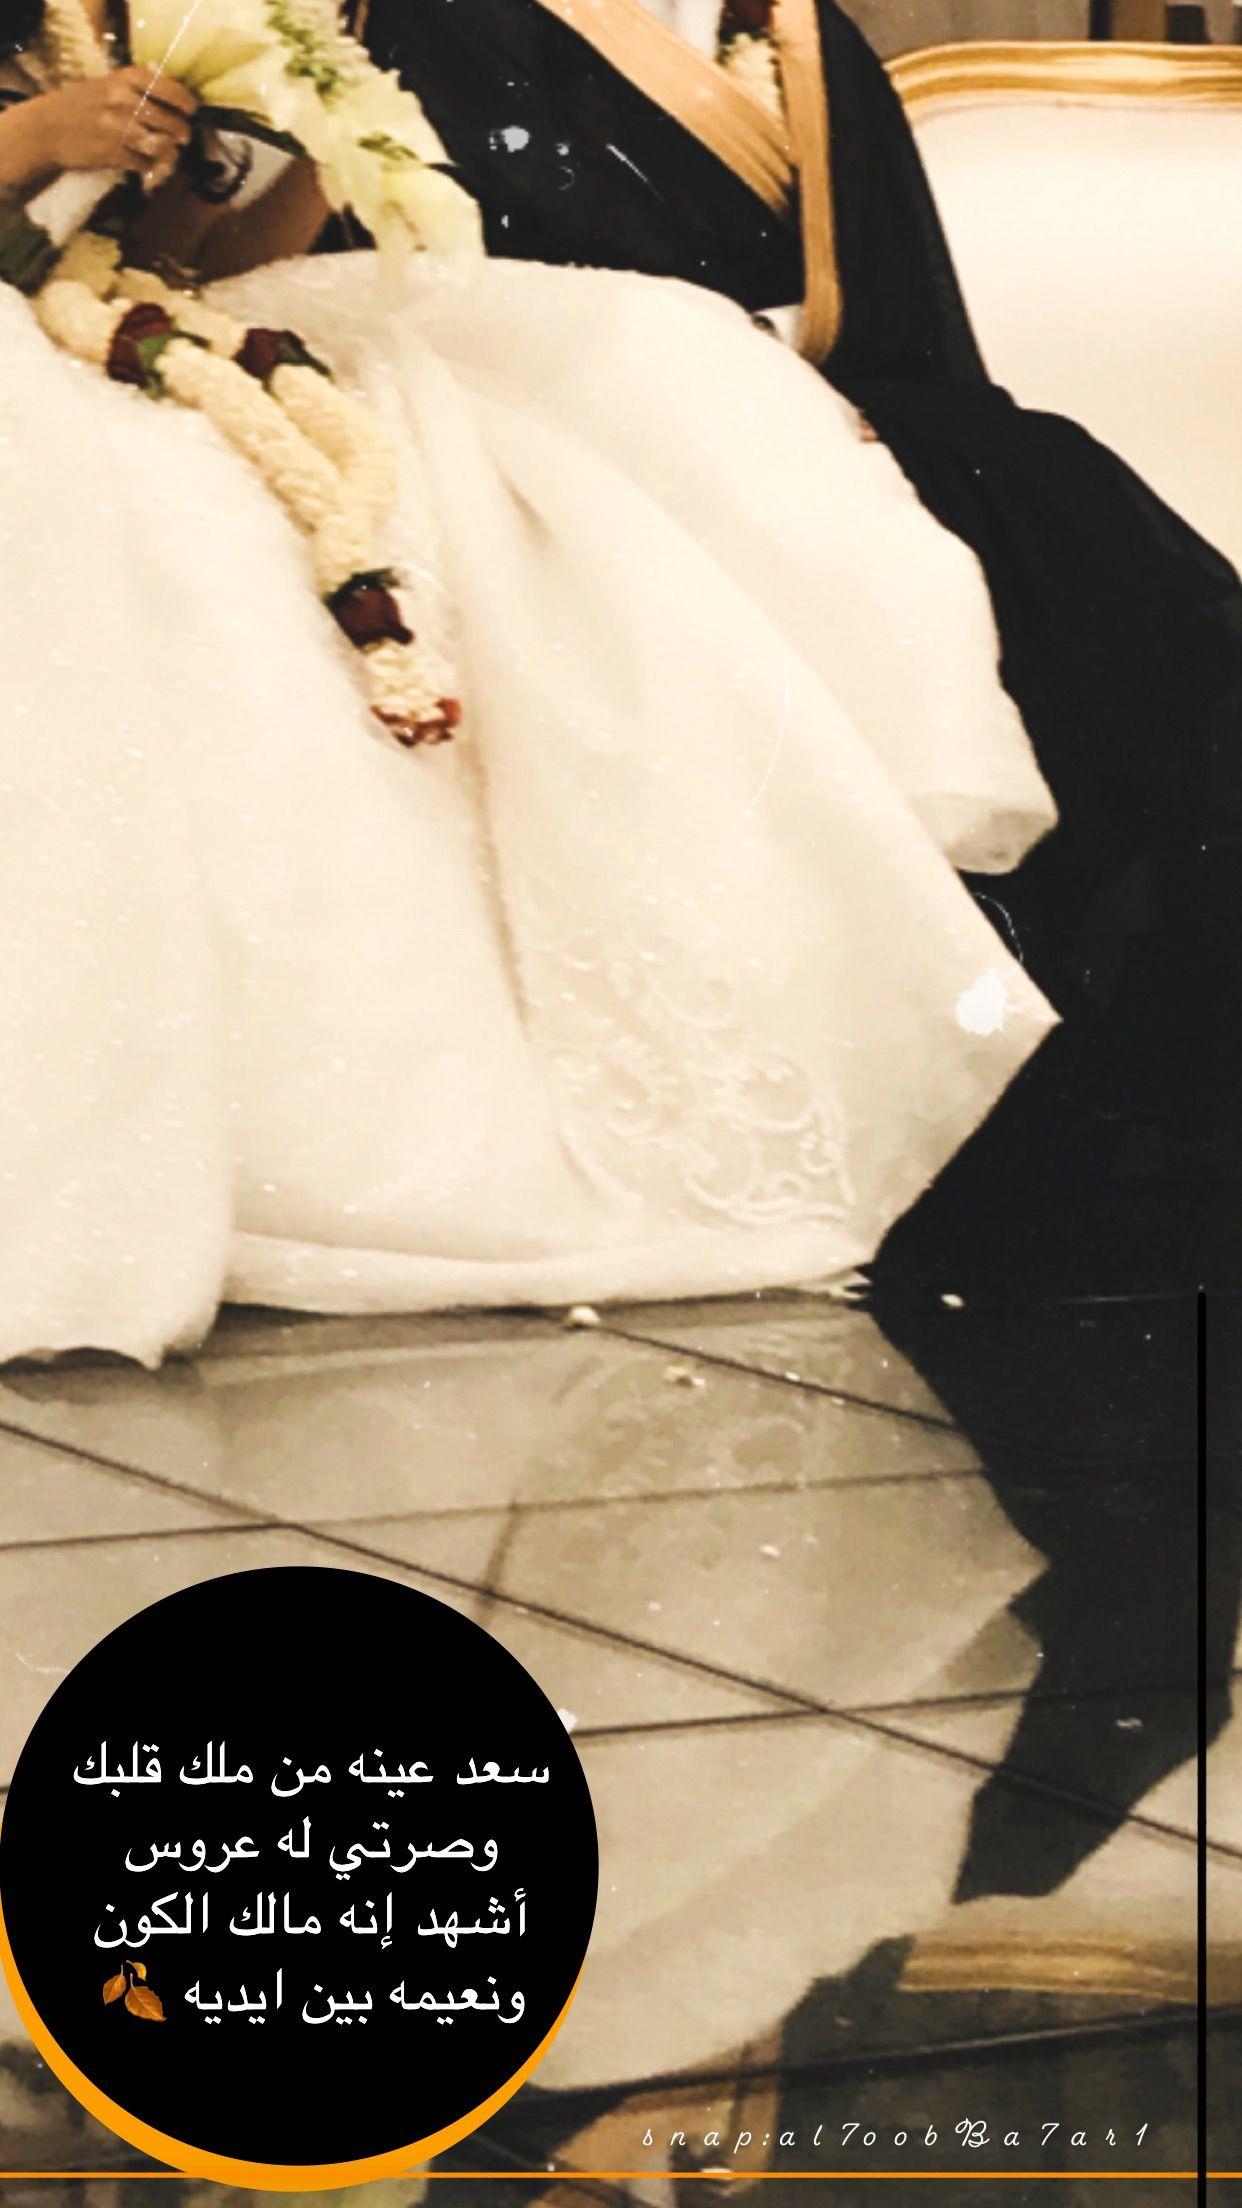 Pin By Soosra Soosra On صور Bride Quotes Wedding Logo Design Arab Wedding